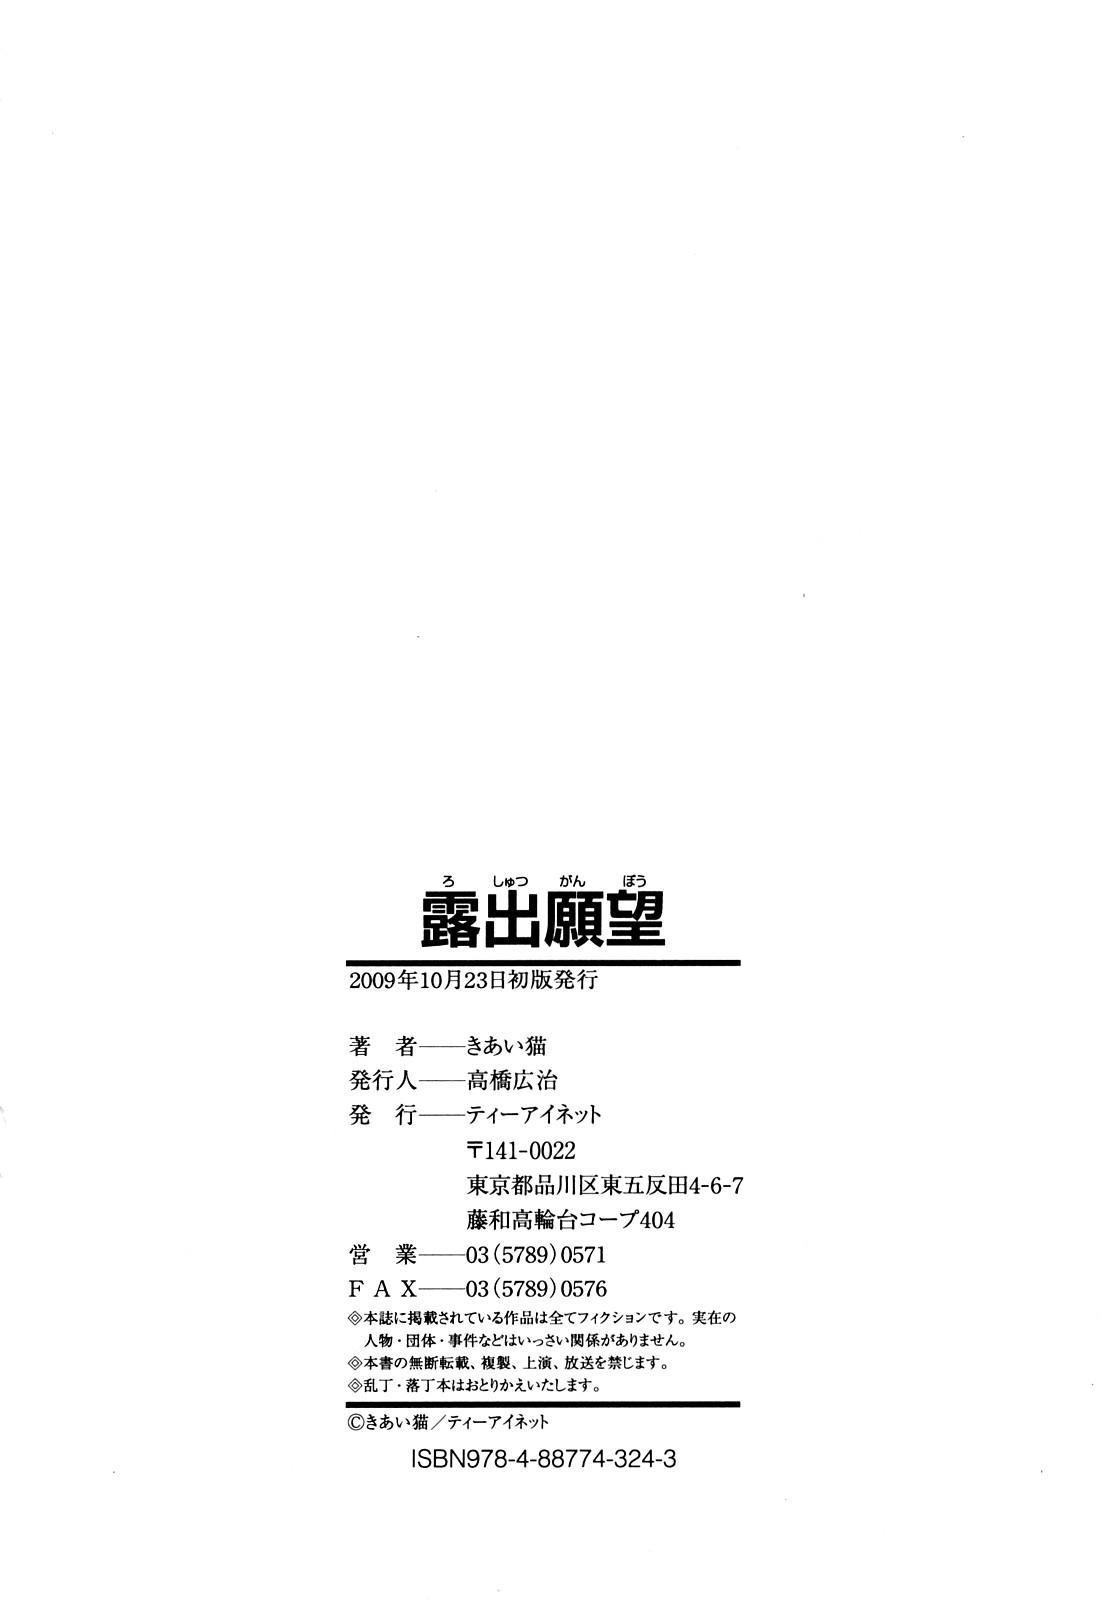 Rosyutsu Ganbou 230